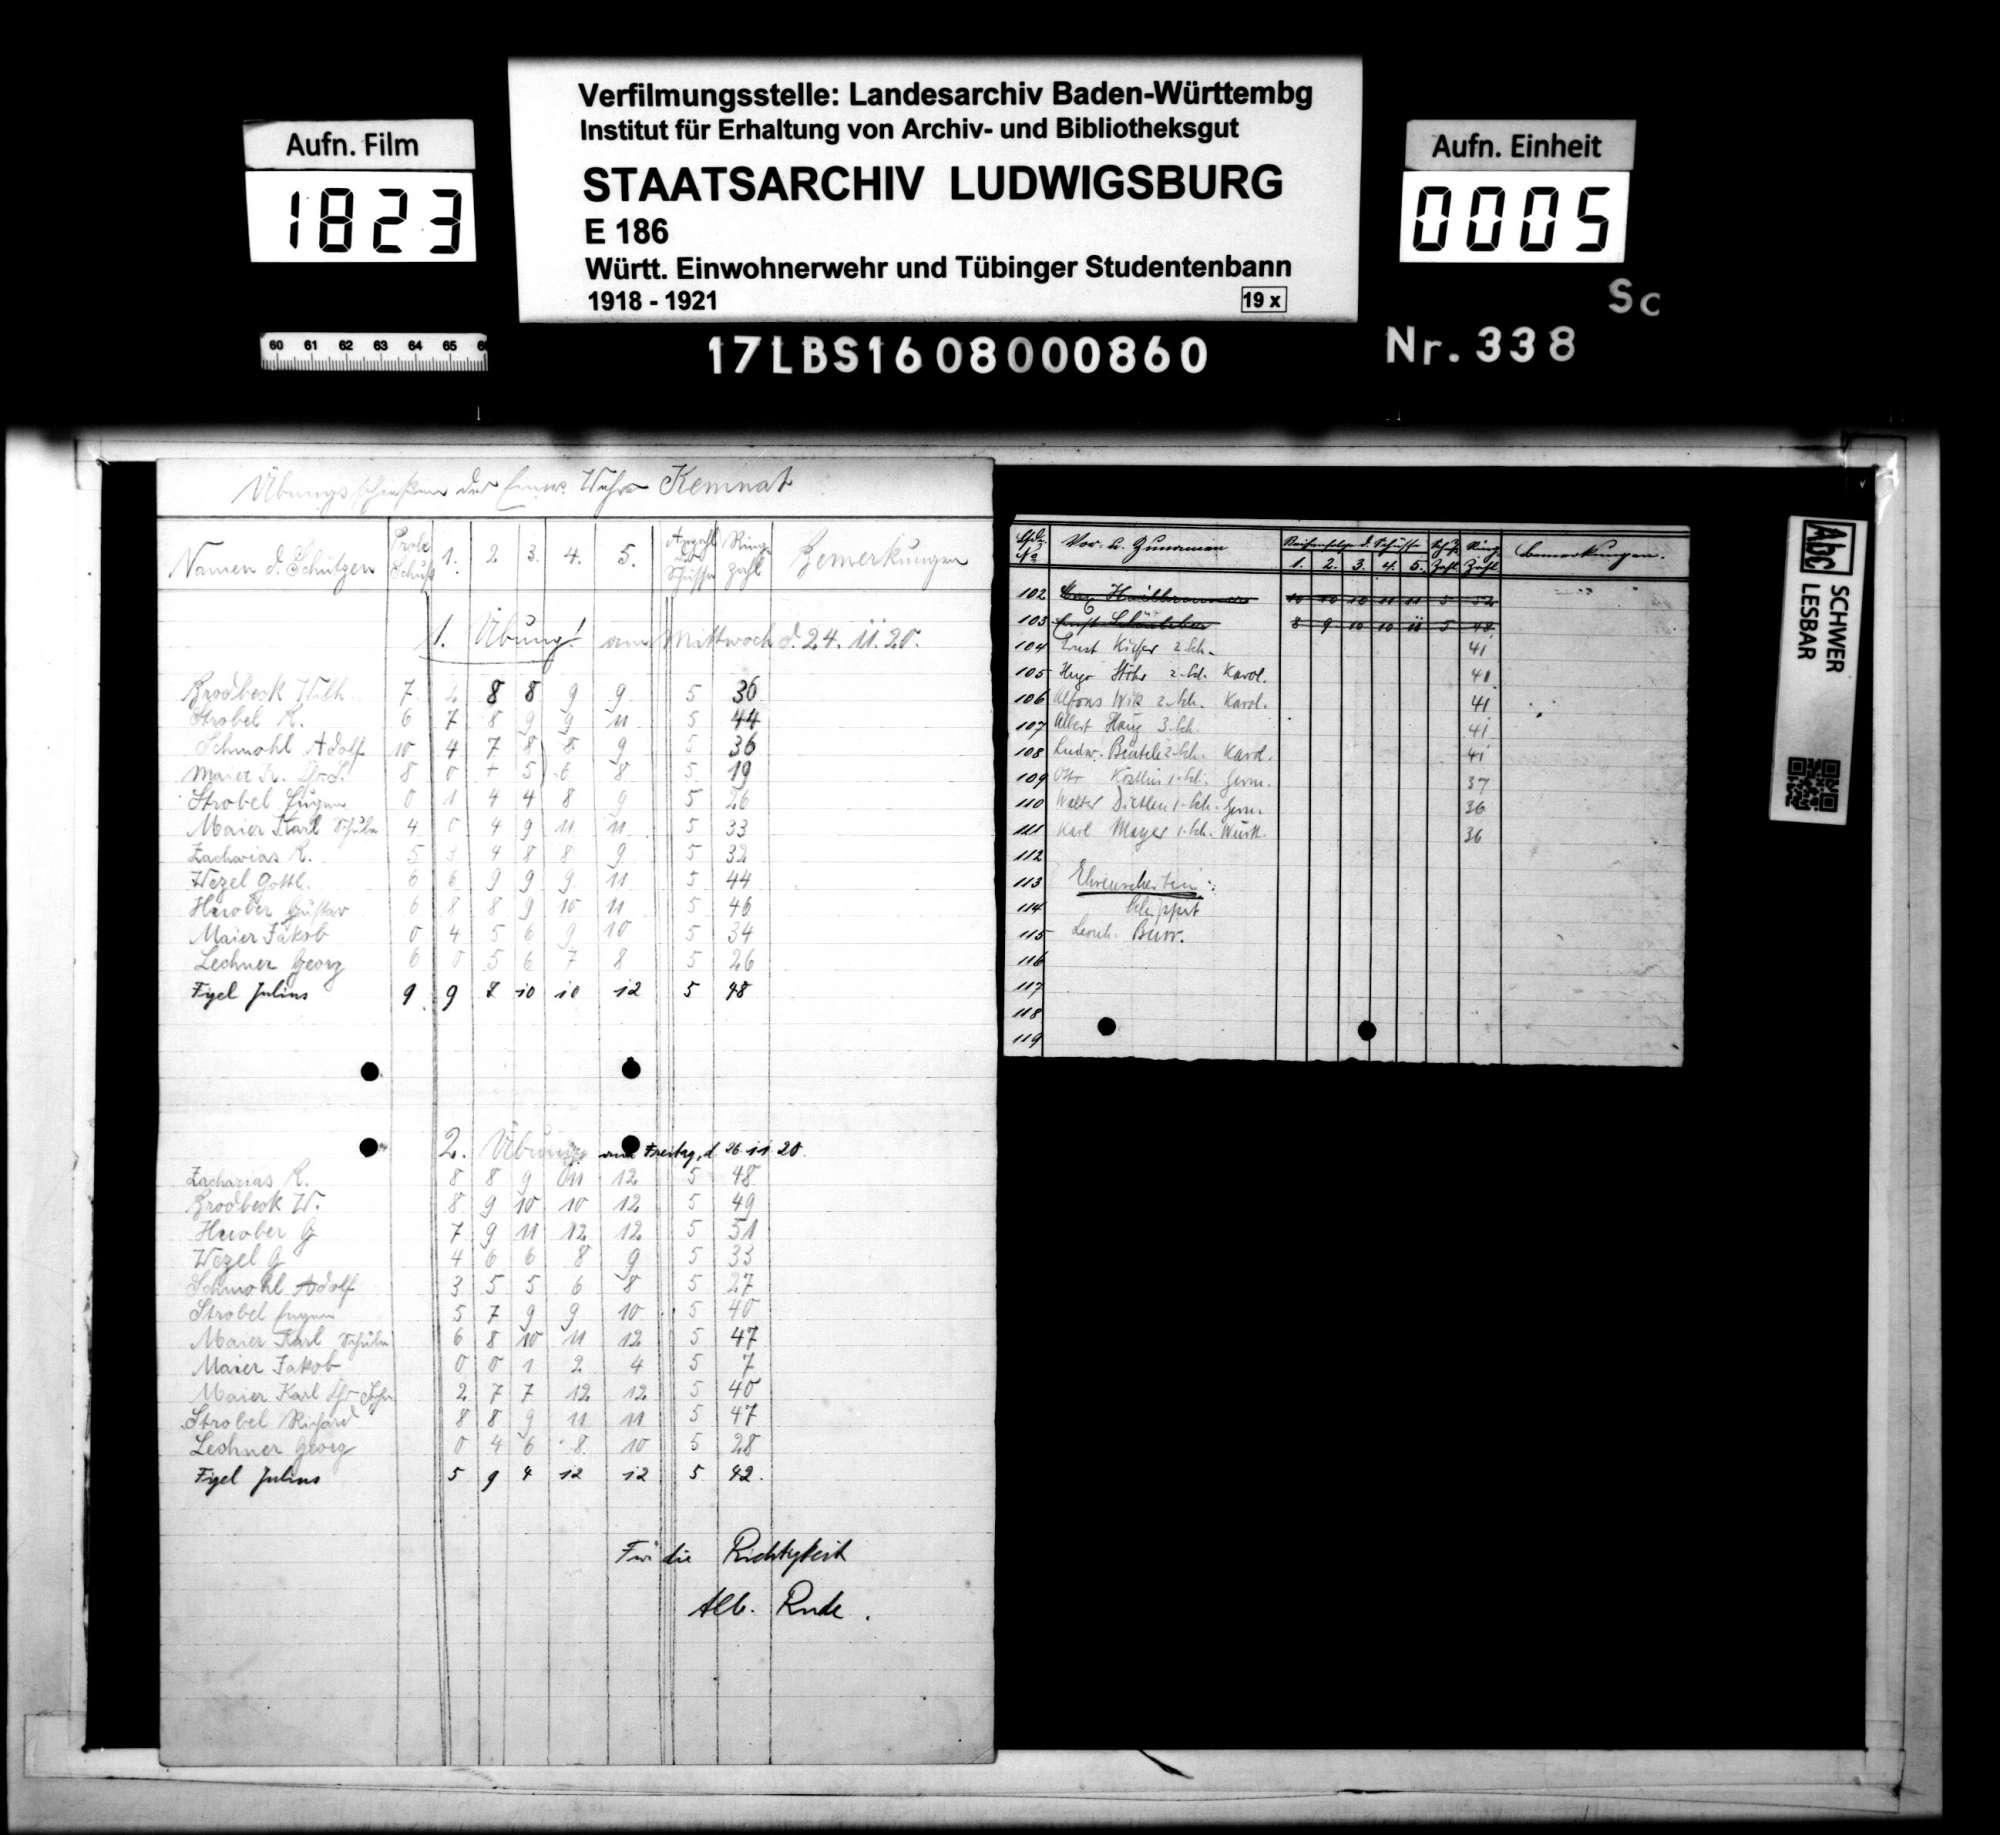 Preisschießen am 12.12.1920: Namenslisten, Bild 3